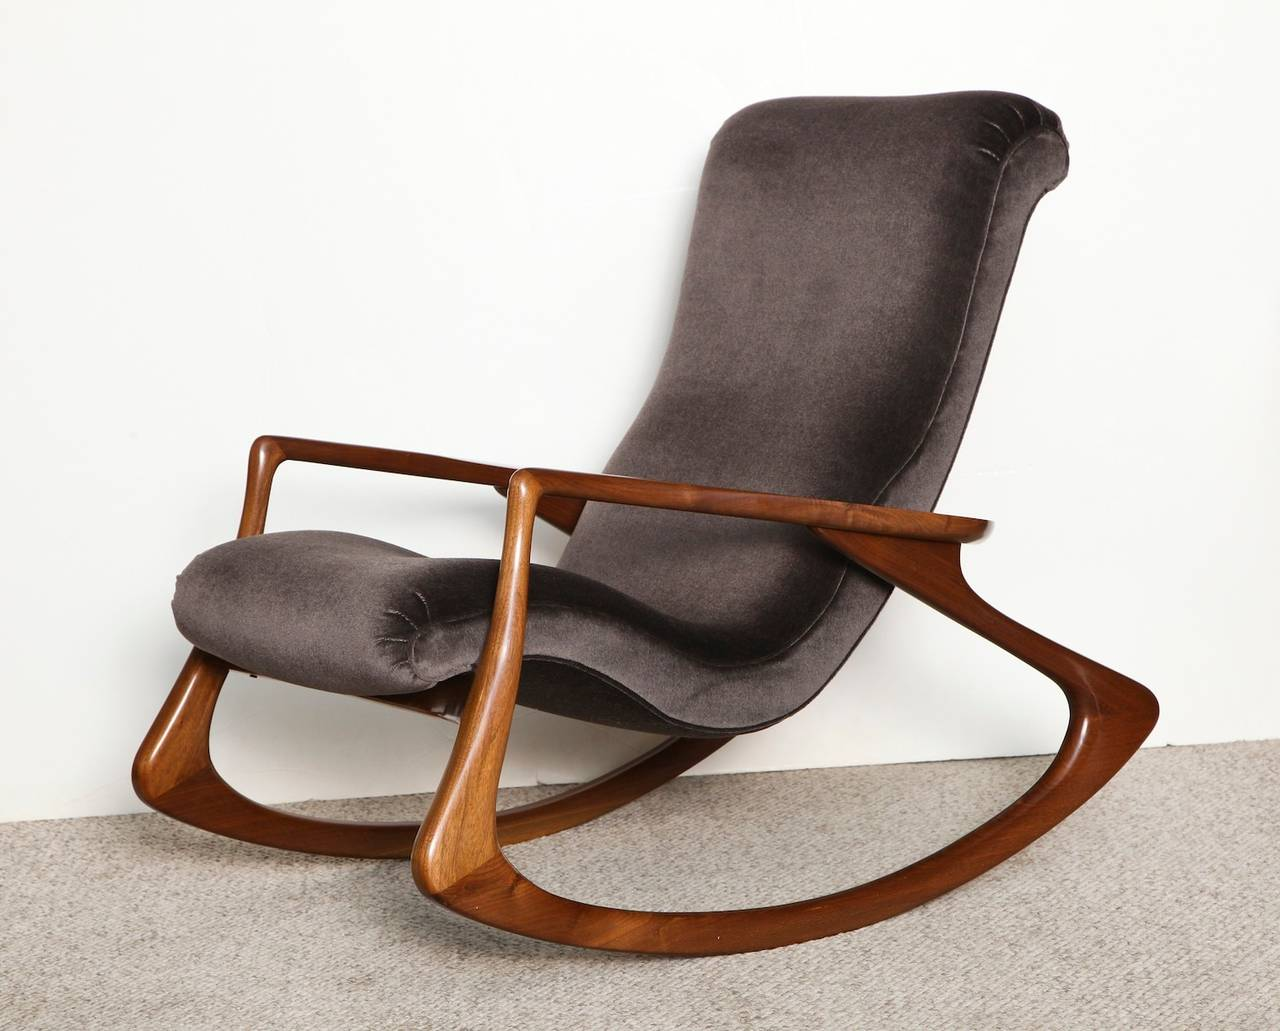 Merveilleux Contour Rocking Chair By Vladimir Kagan. Sculpted Walnut Frame With Dark  Velvet Upholstery. A